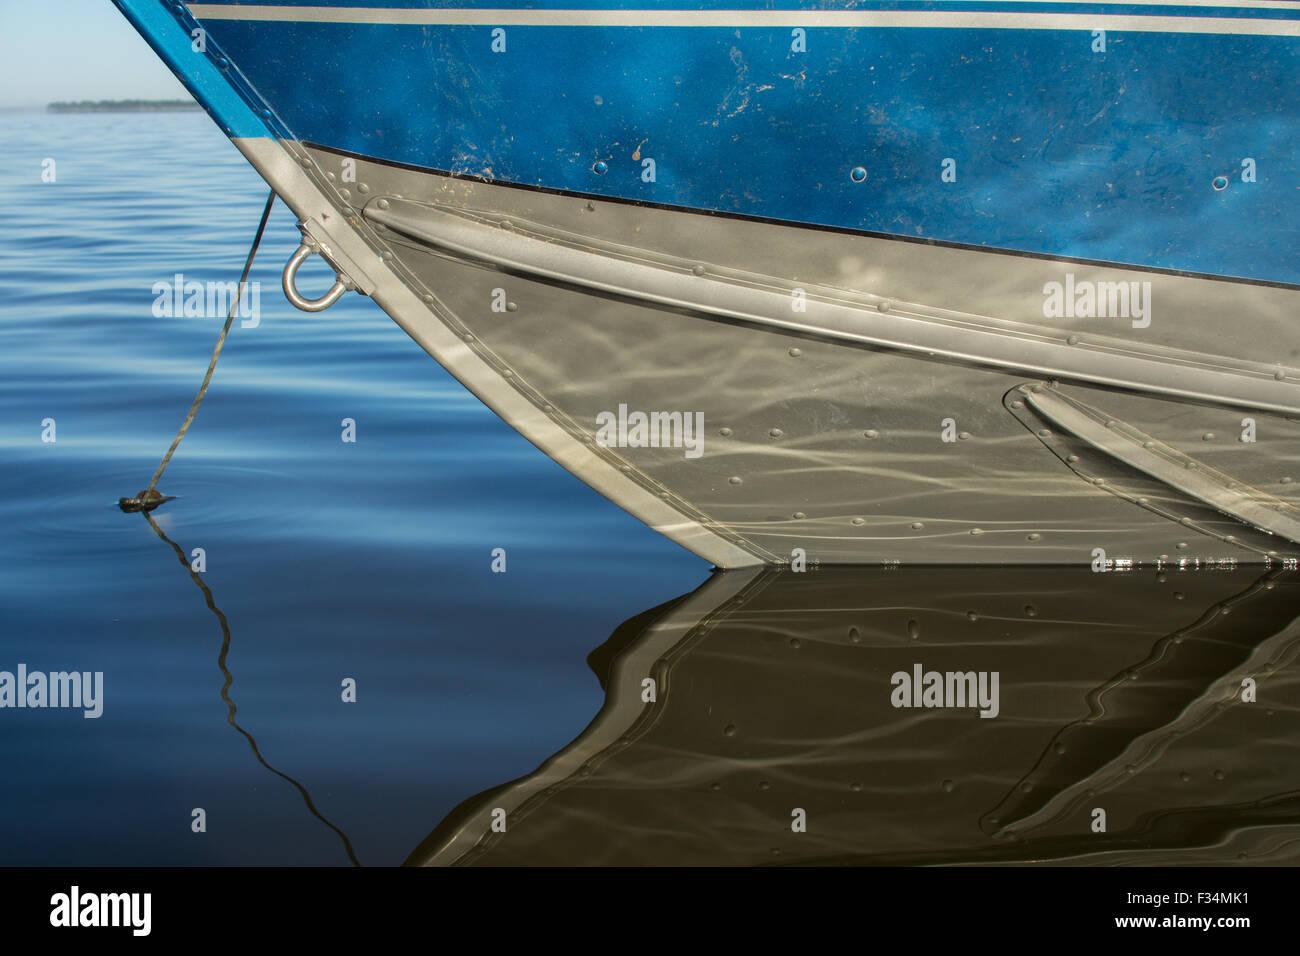 Painted Aluminum Boat Stock Photos Painted Aluminum Boat